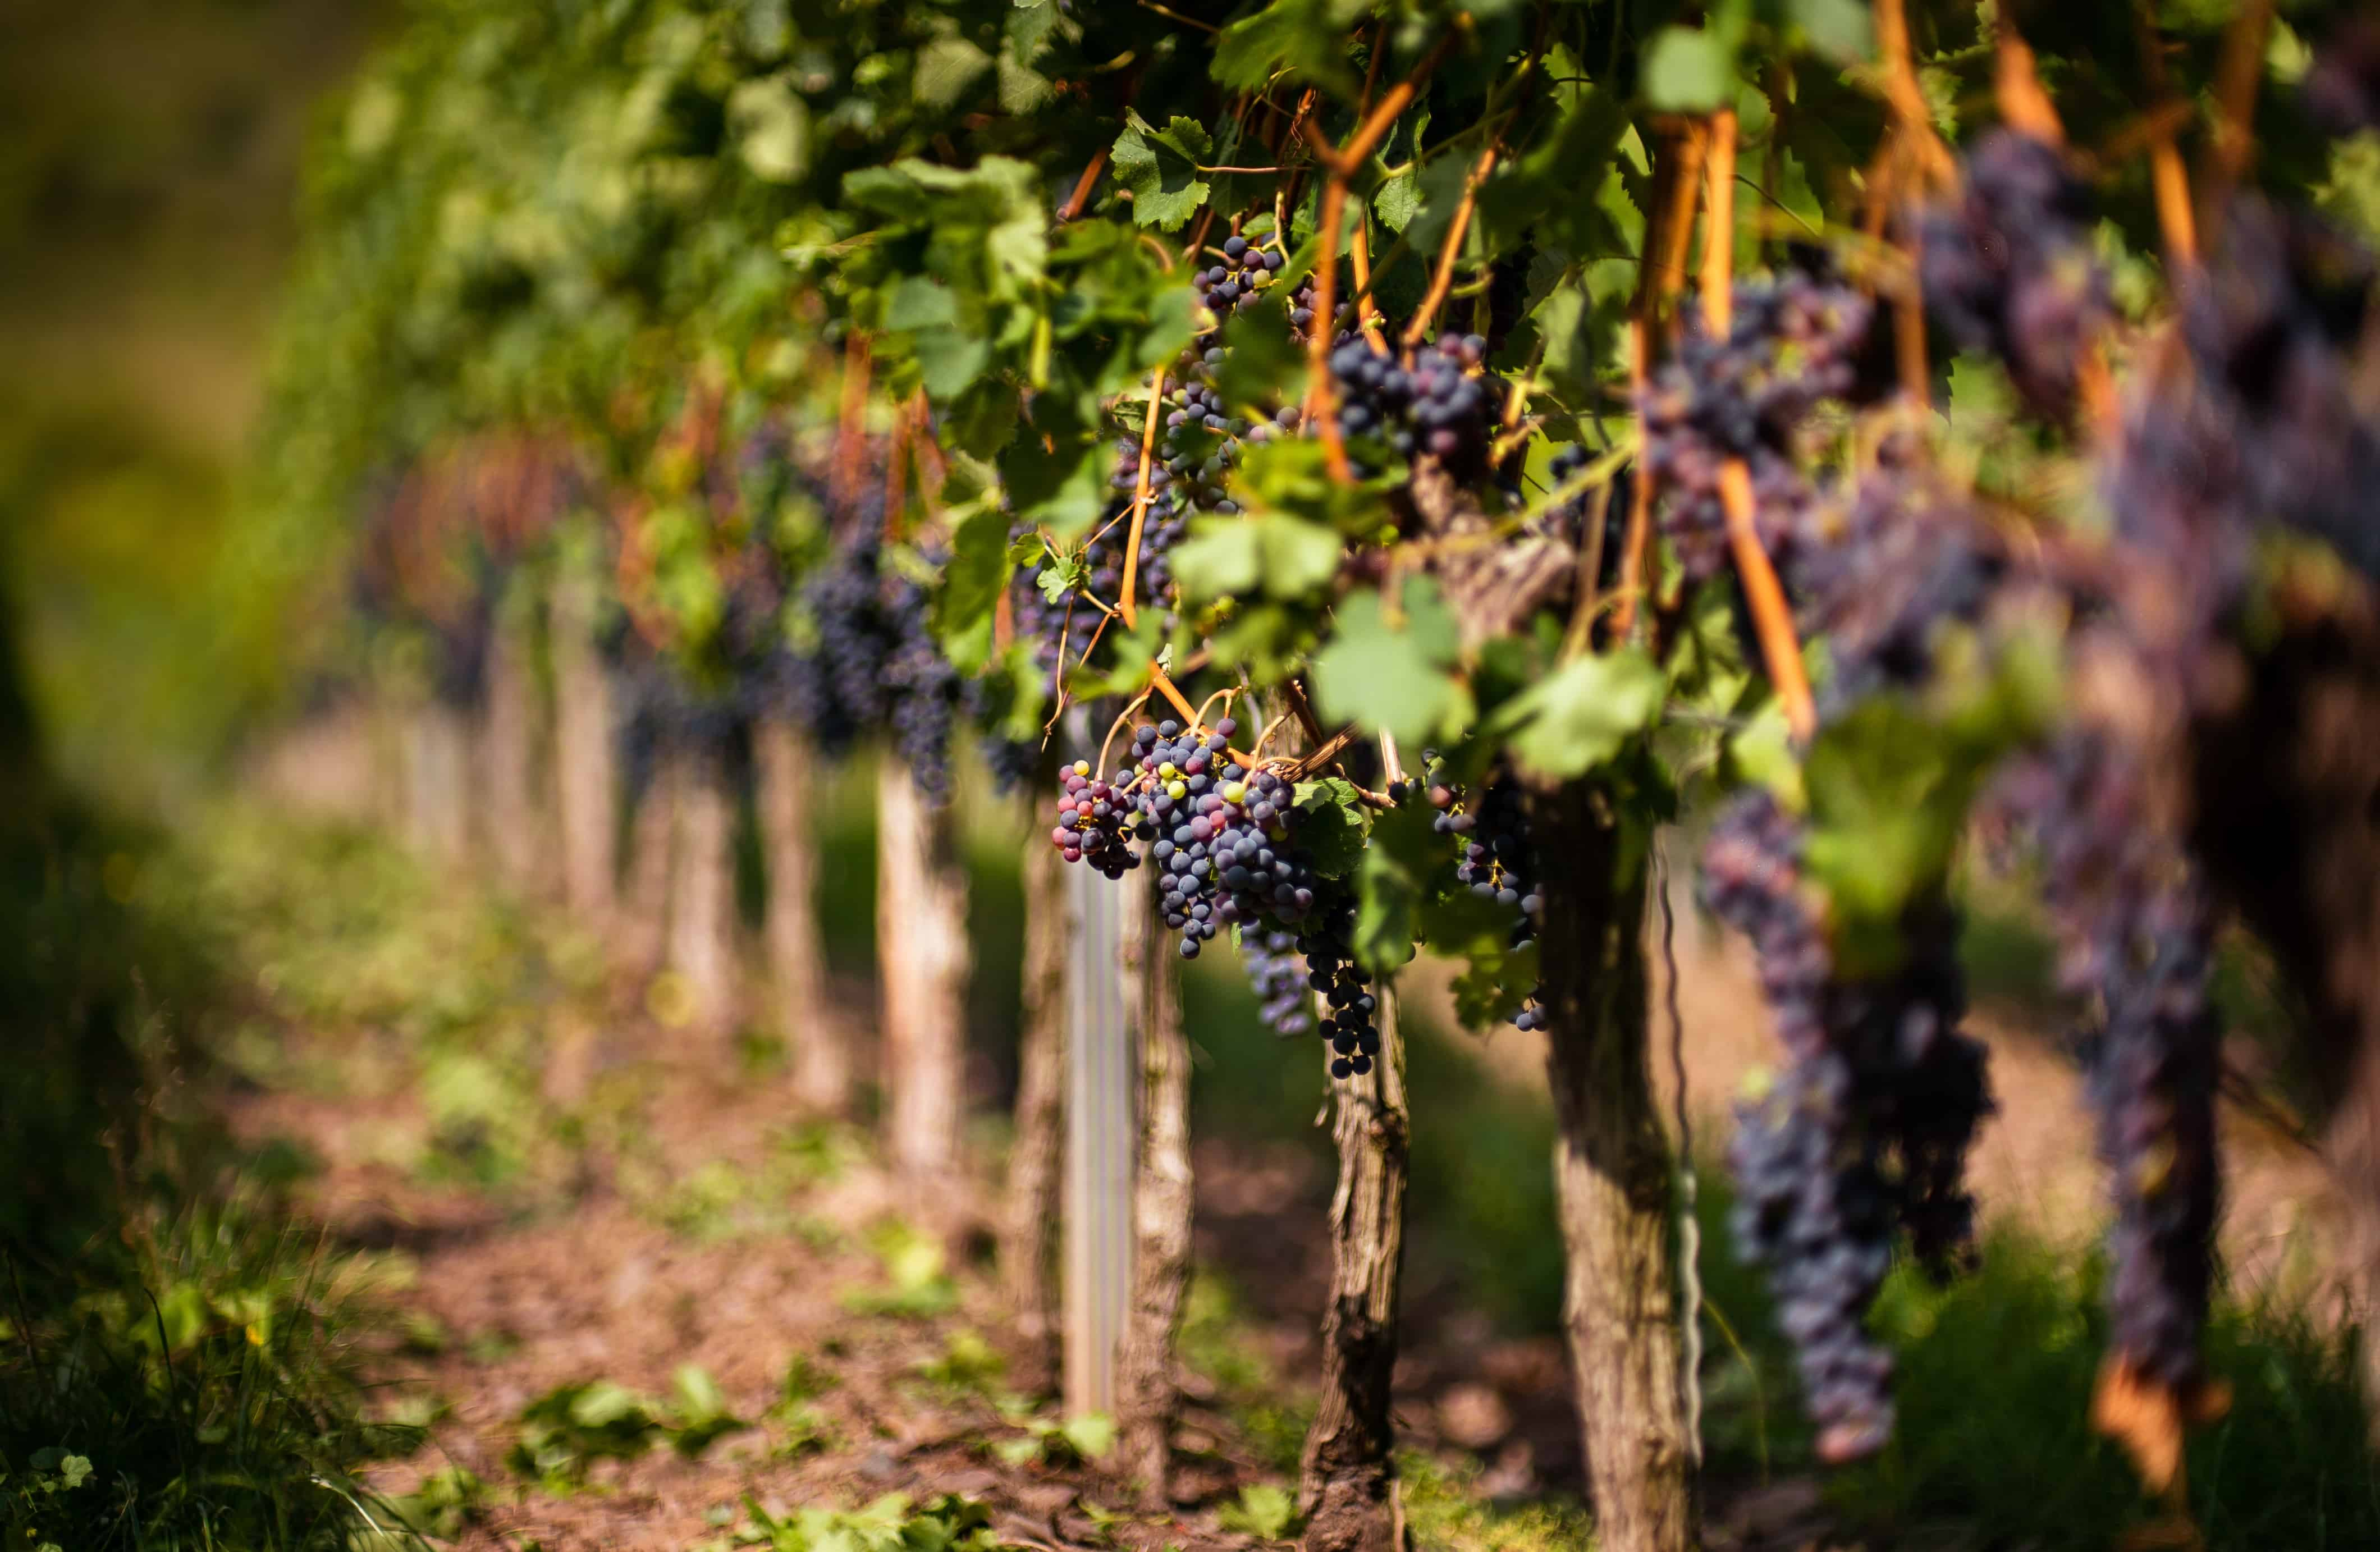 grape vineyards, wine facts